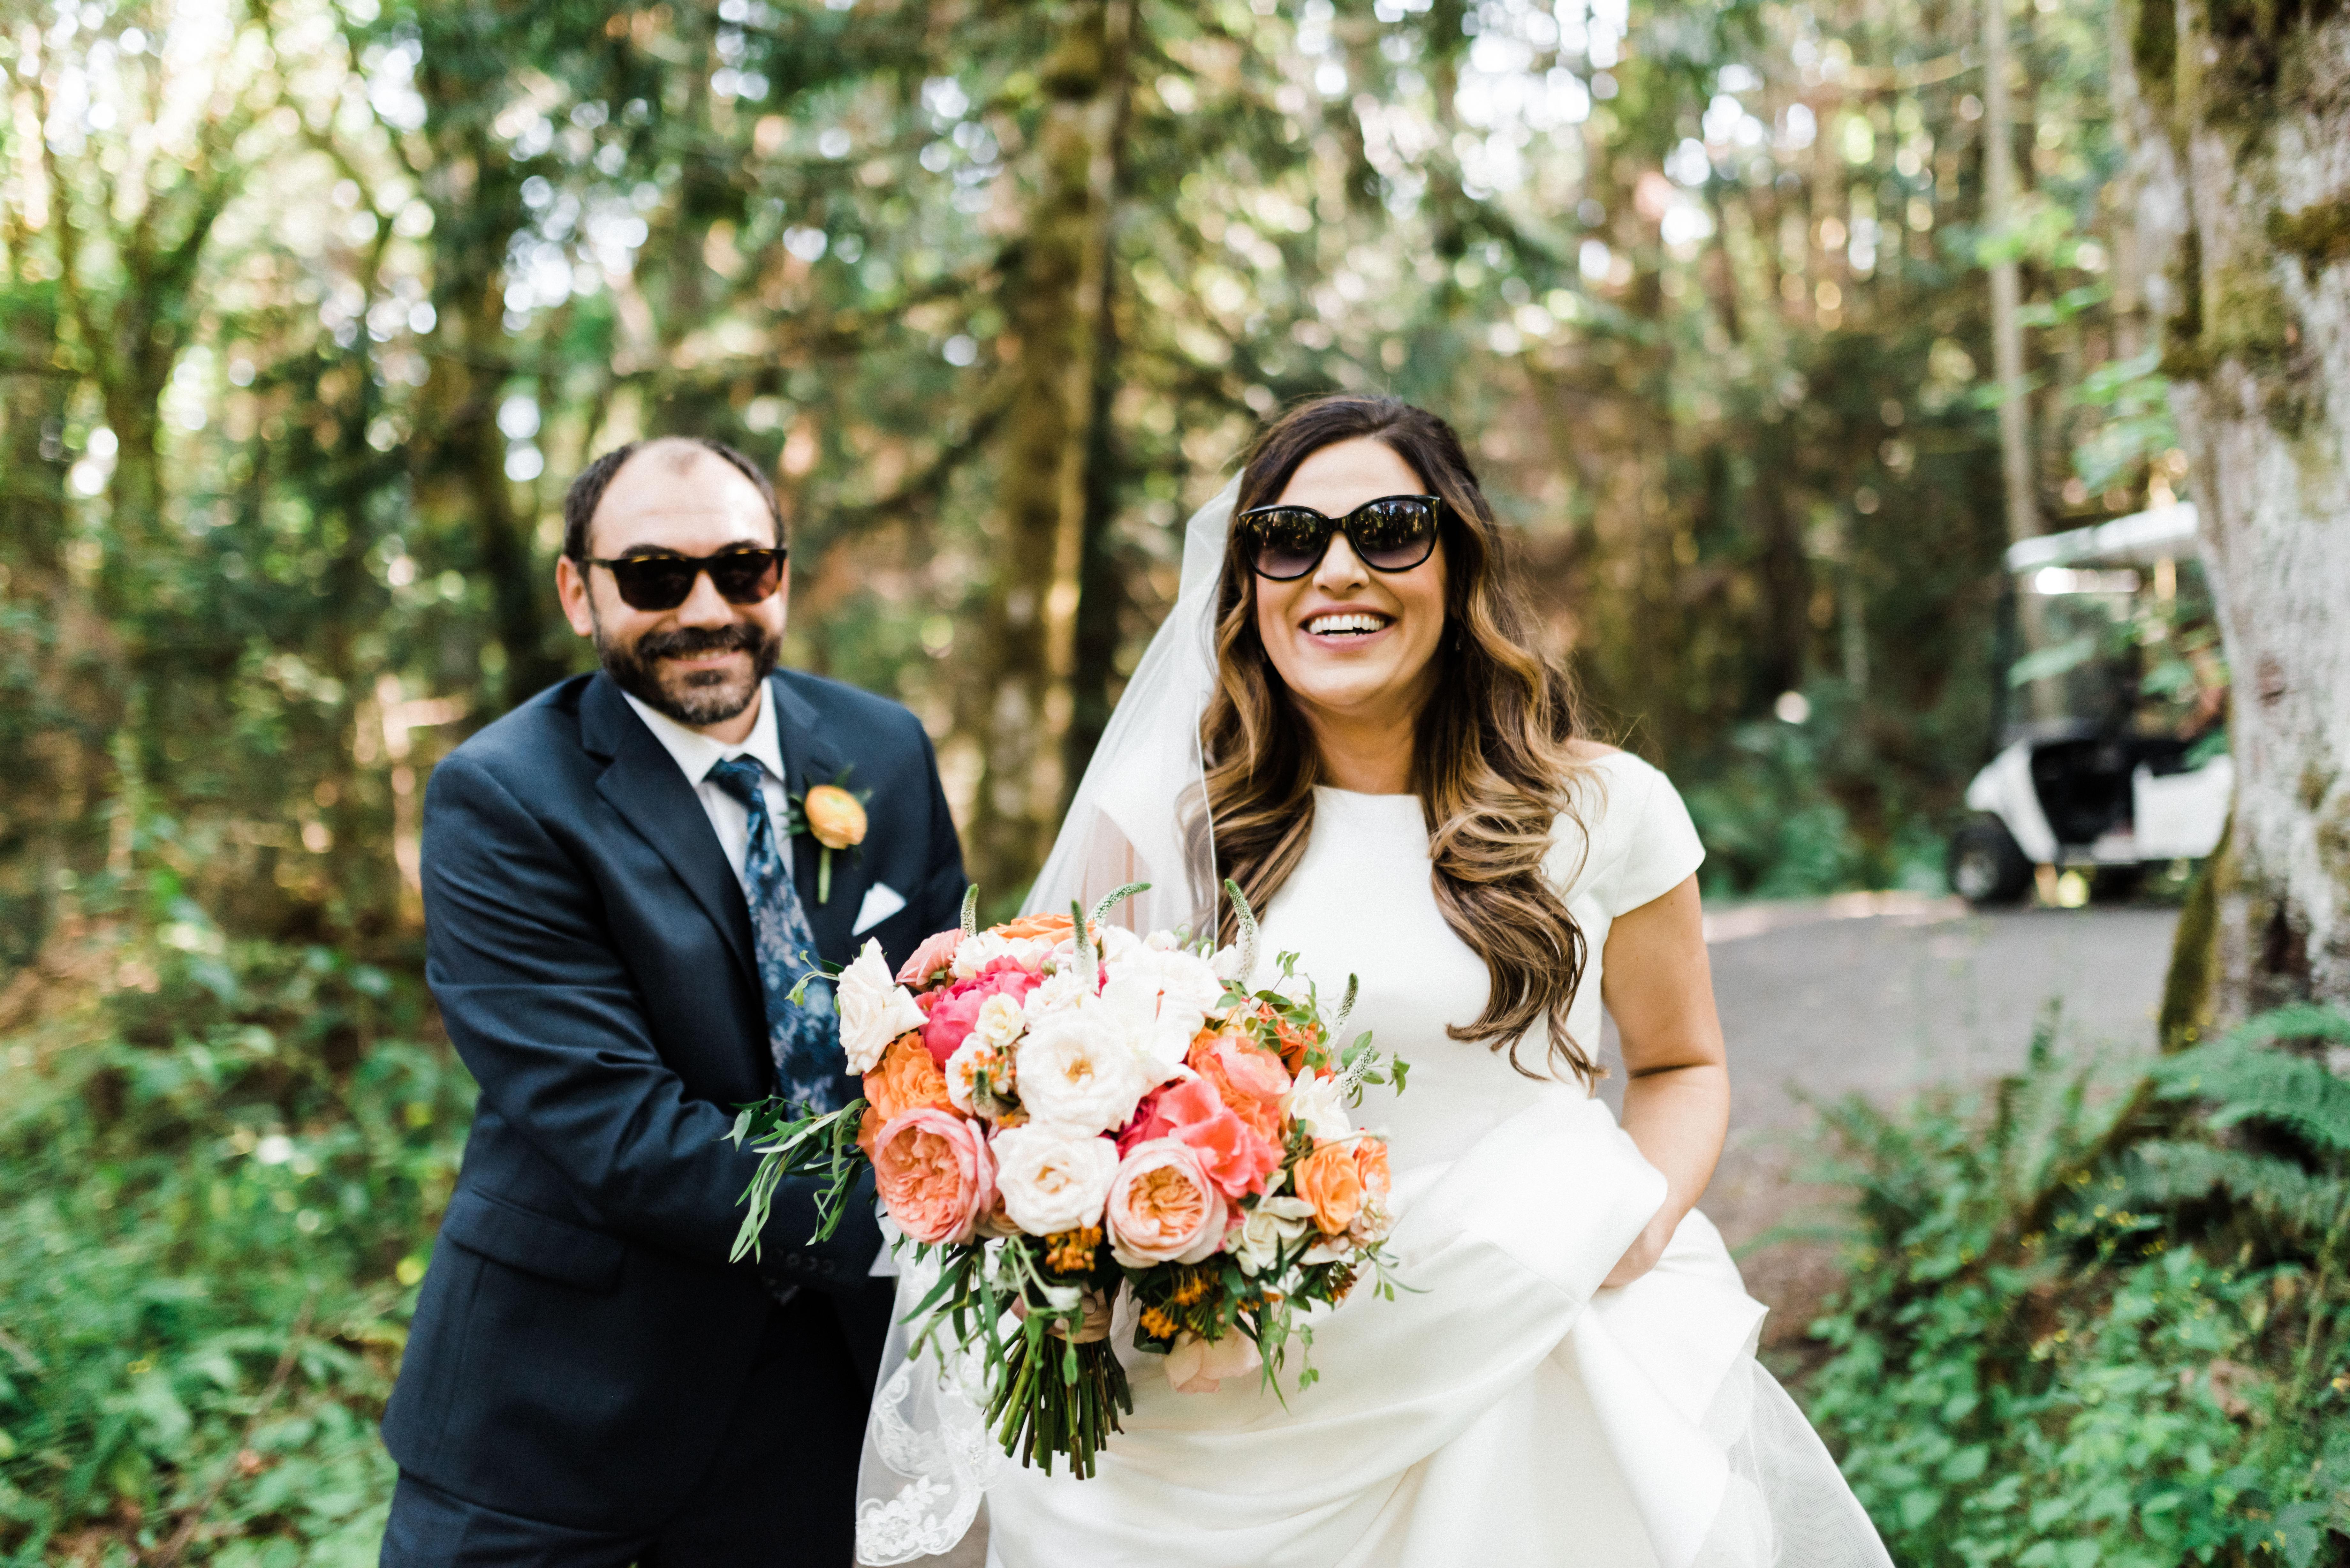 a wedding couple in sunglasses at IslandWood, an Outdoor Wedding Venue